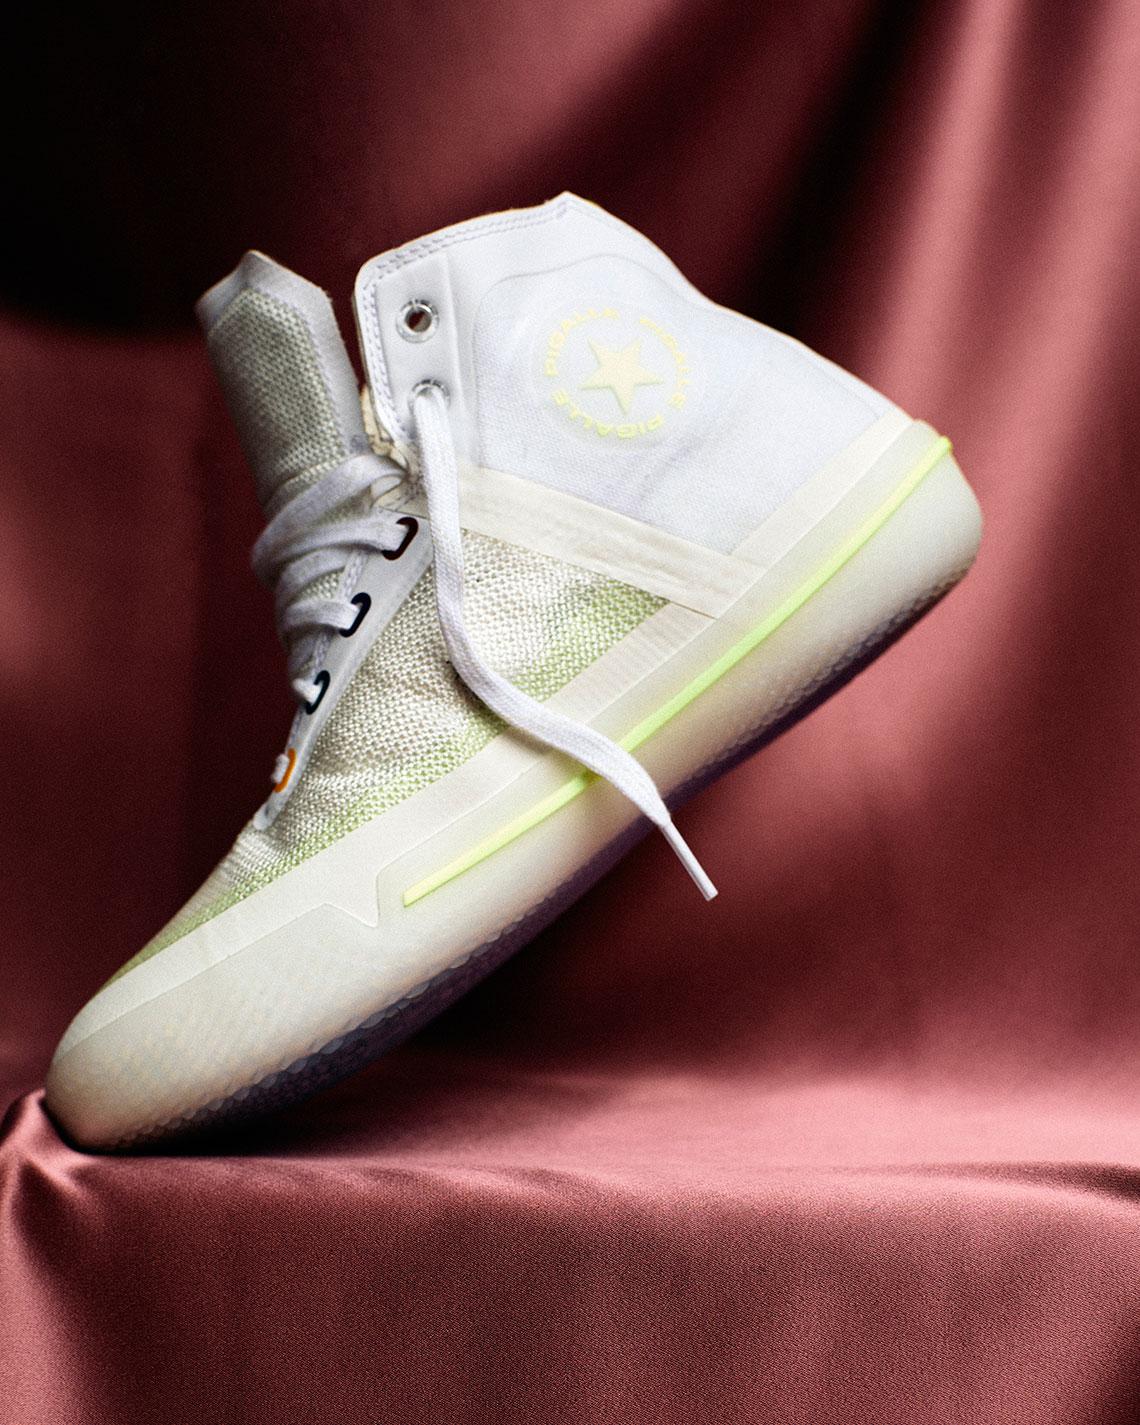 8bae6bb3242 Pigalle Paris Converse All Star Pro BB Release Date | SneakerNews.com